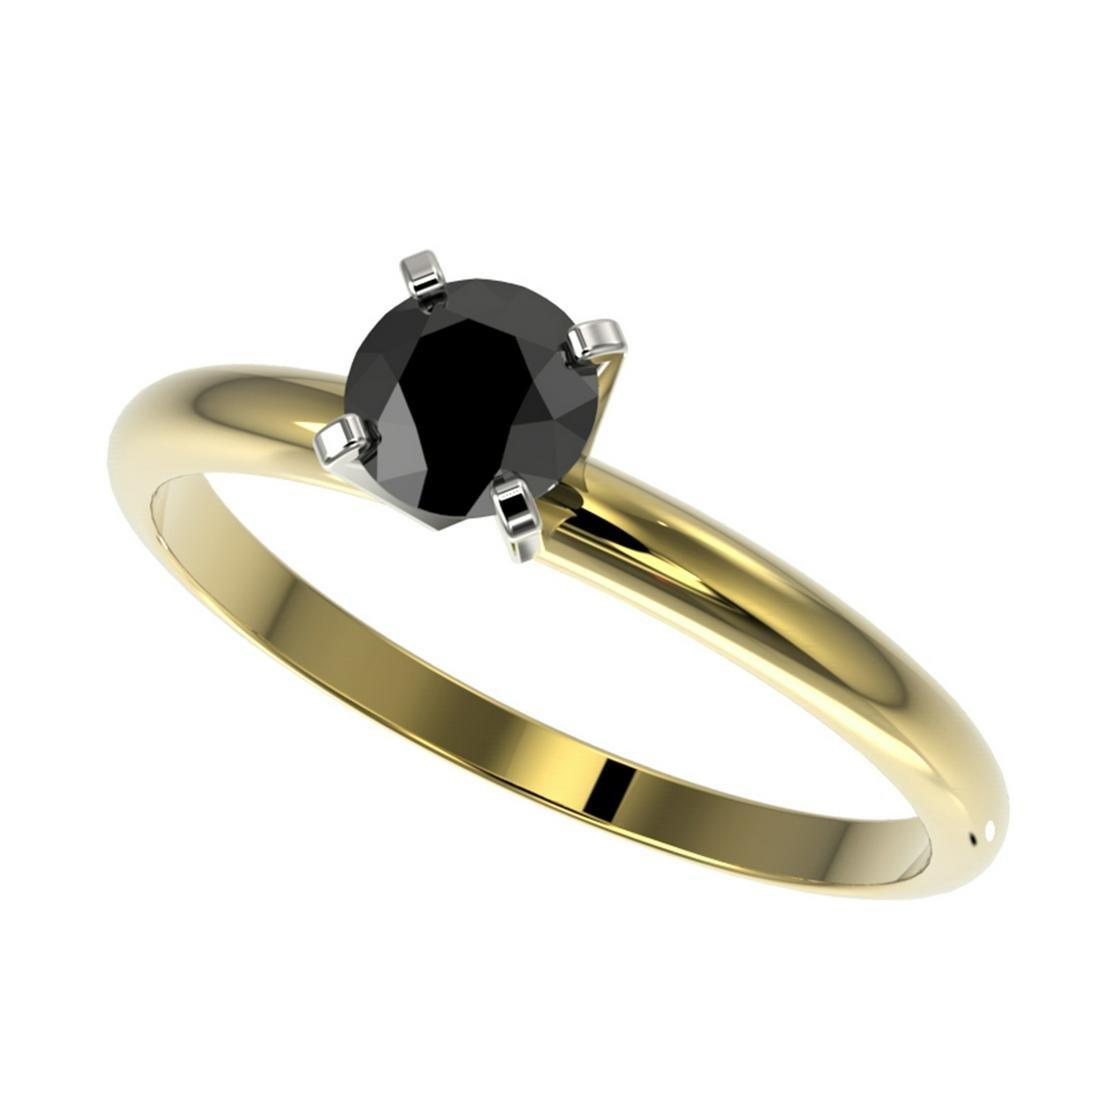 0.50 ctw Fancy Black Diamond Solitaire Ring 10K Yellow